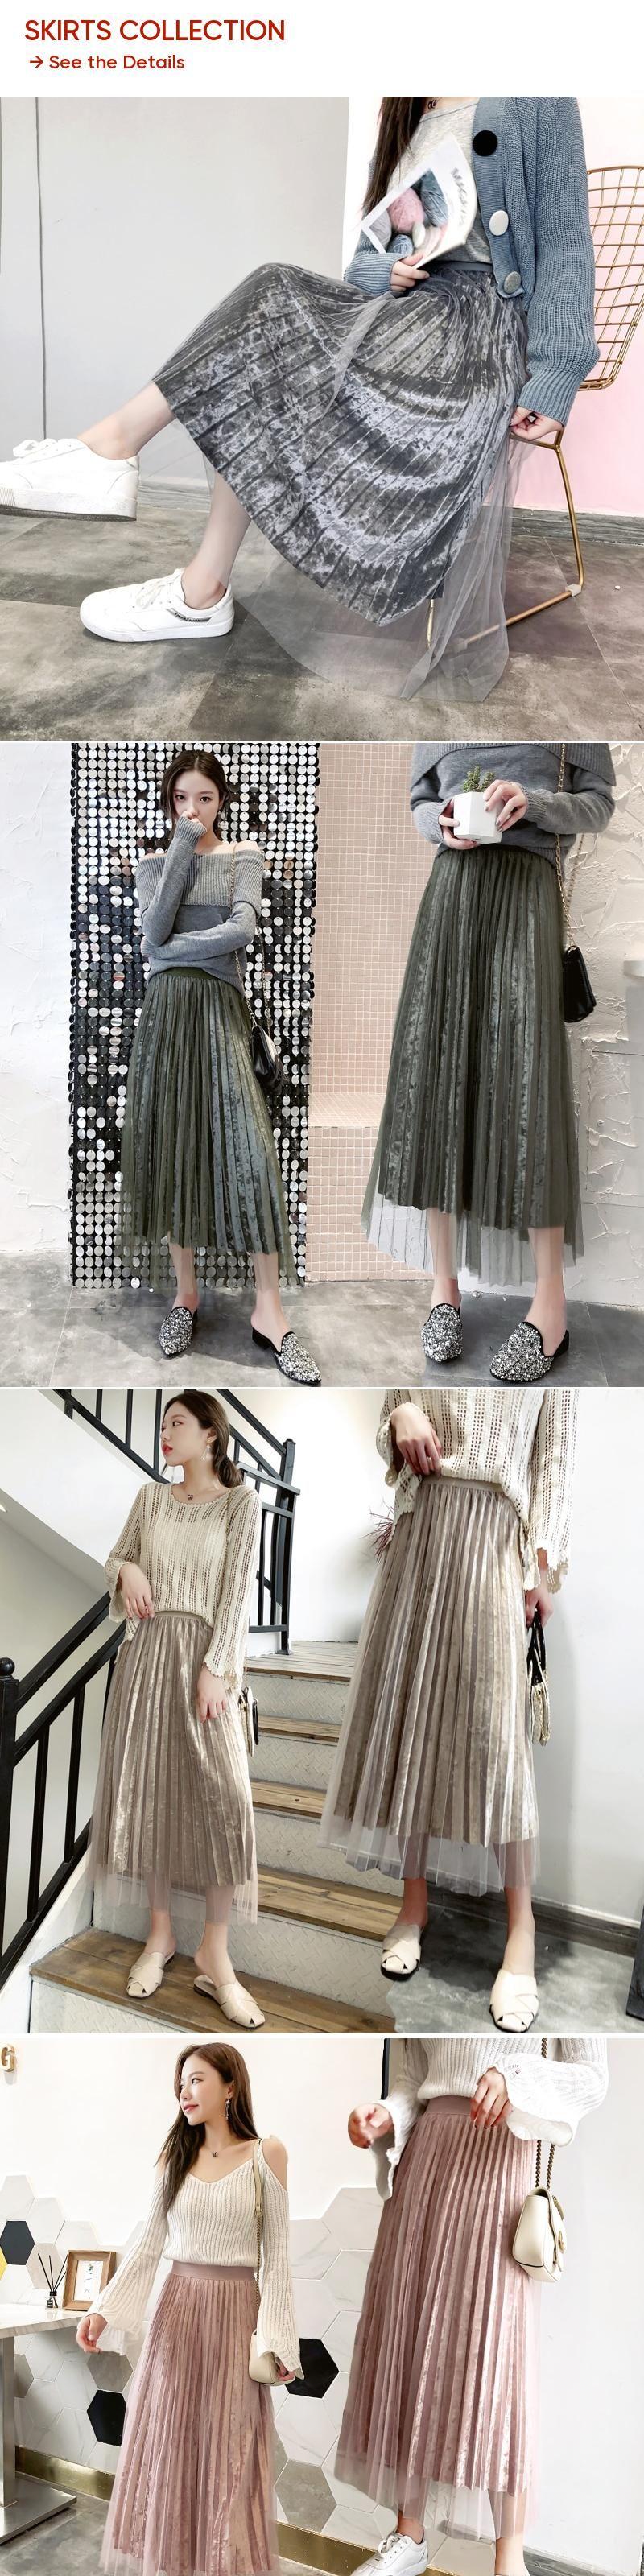 4ee80c5d77ed0 Kpop Harajuku 2018 New Fashion Womens Princess Fairy Style Voile Tulle Skirt  Diamond Velvet Pleated Skirt